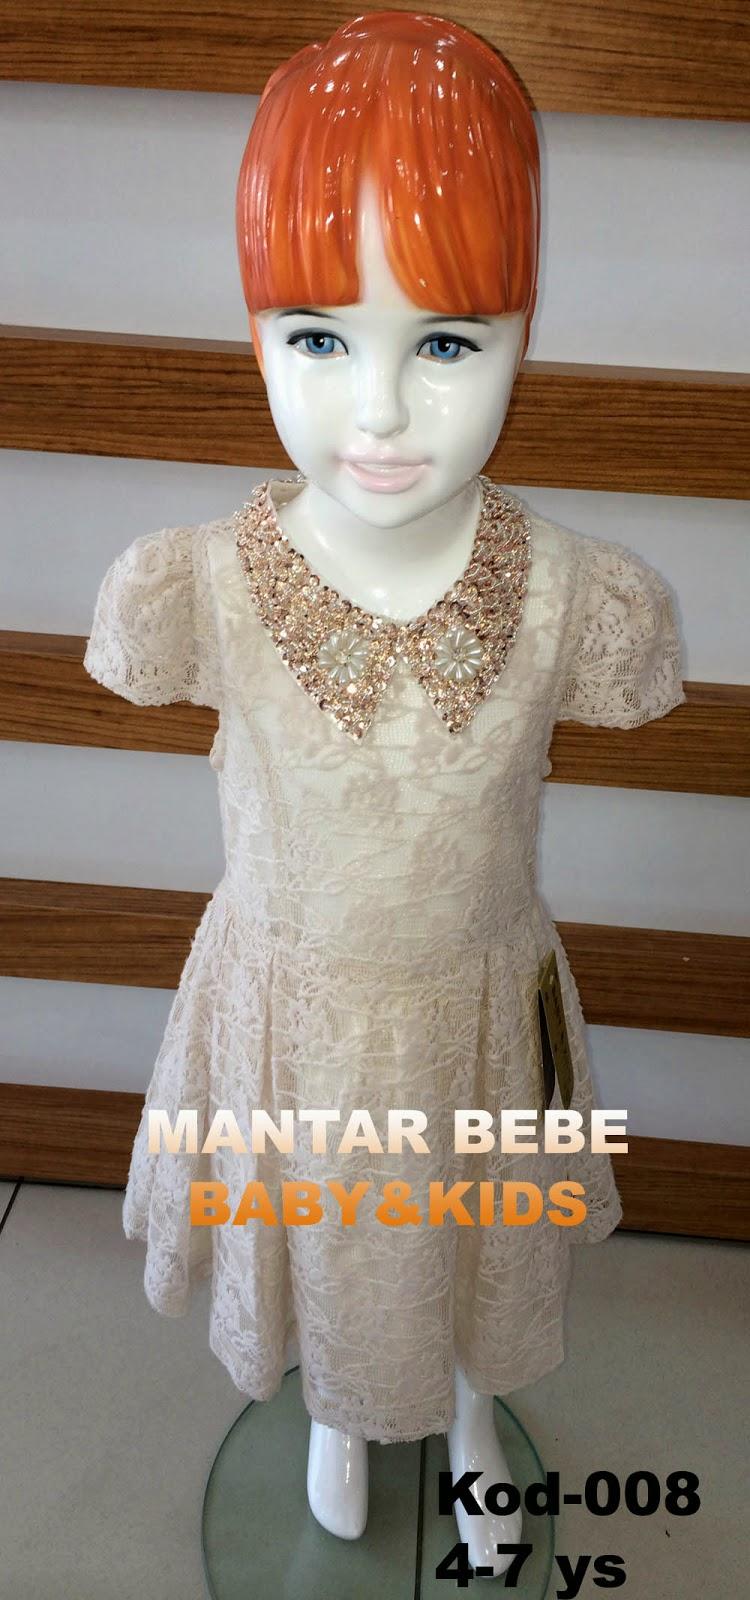 MANTAR BEBE ÇOCUK GİYİM - KOD008